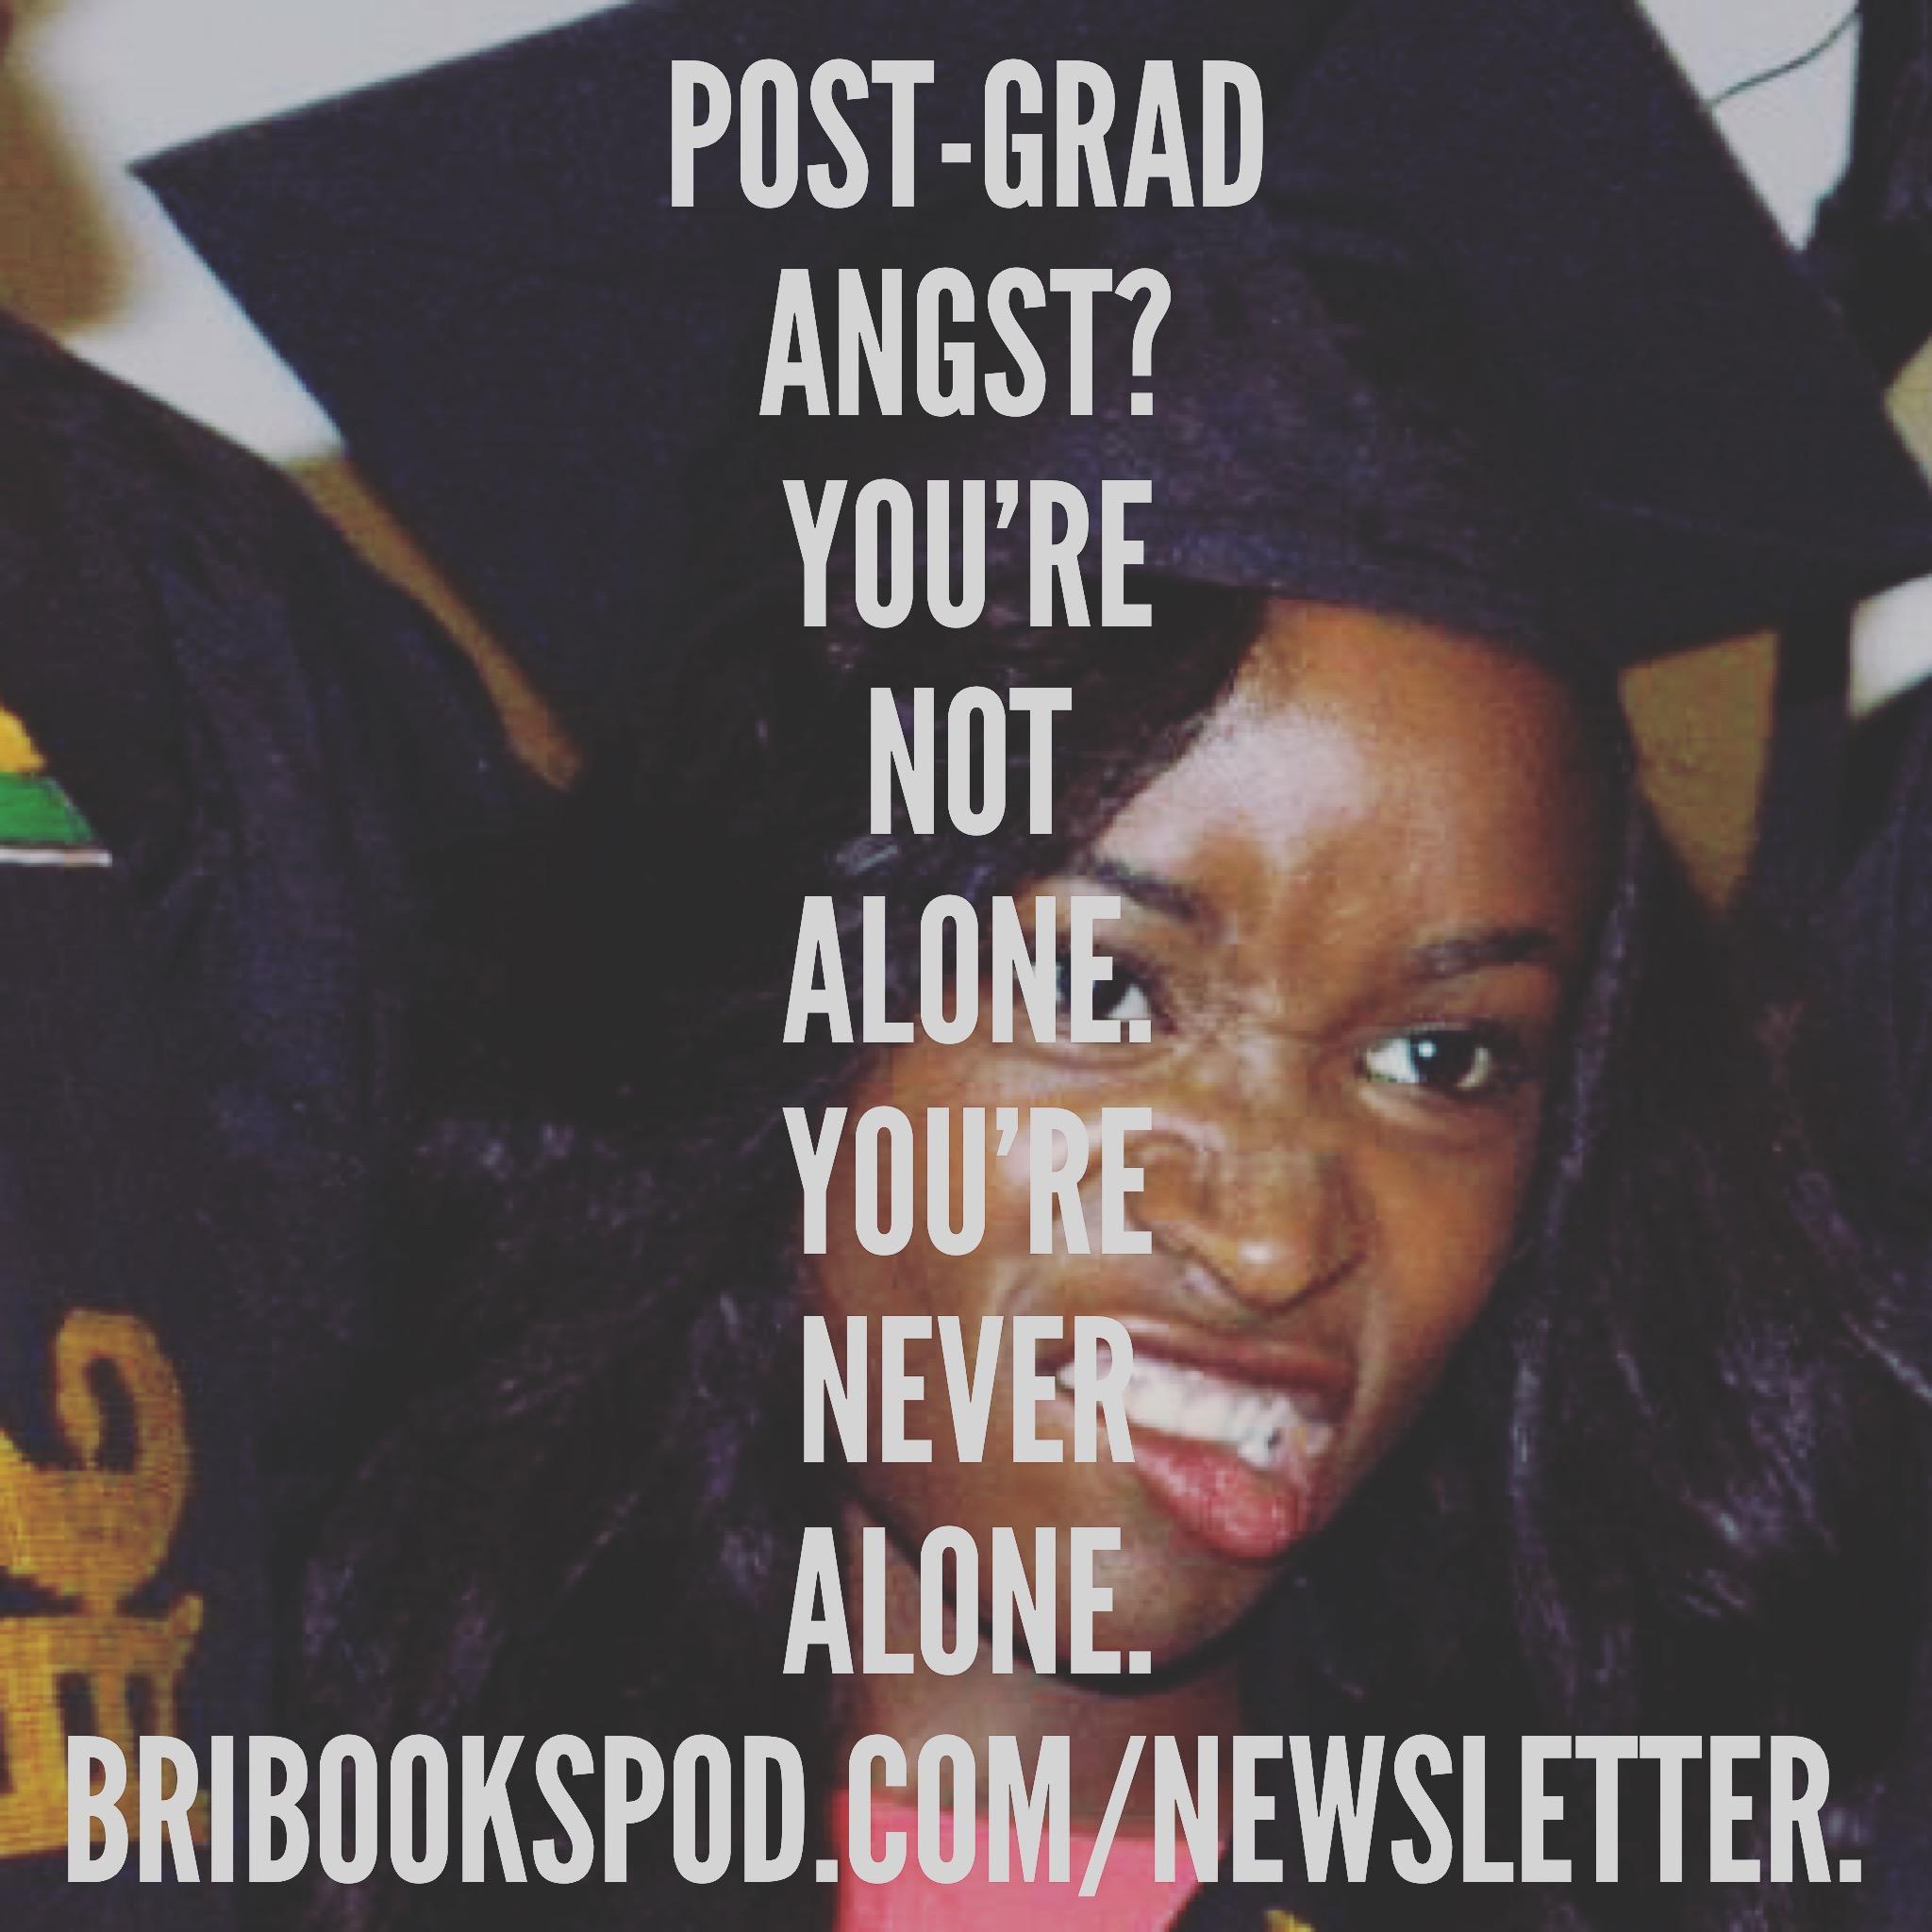 Bri Books Podcast Post Grad